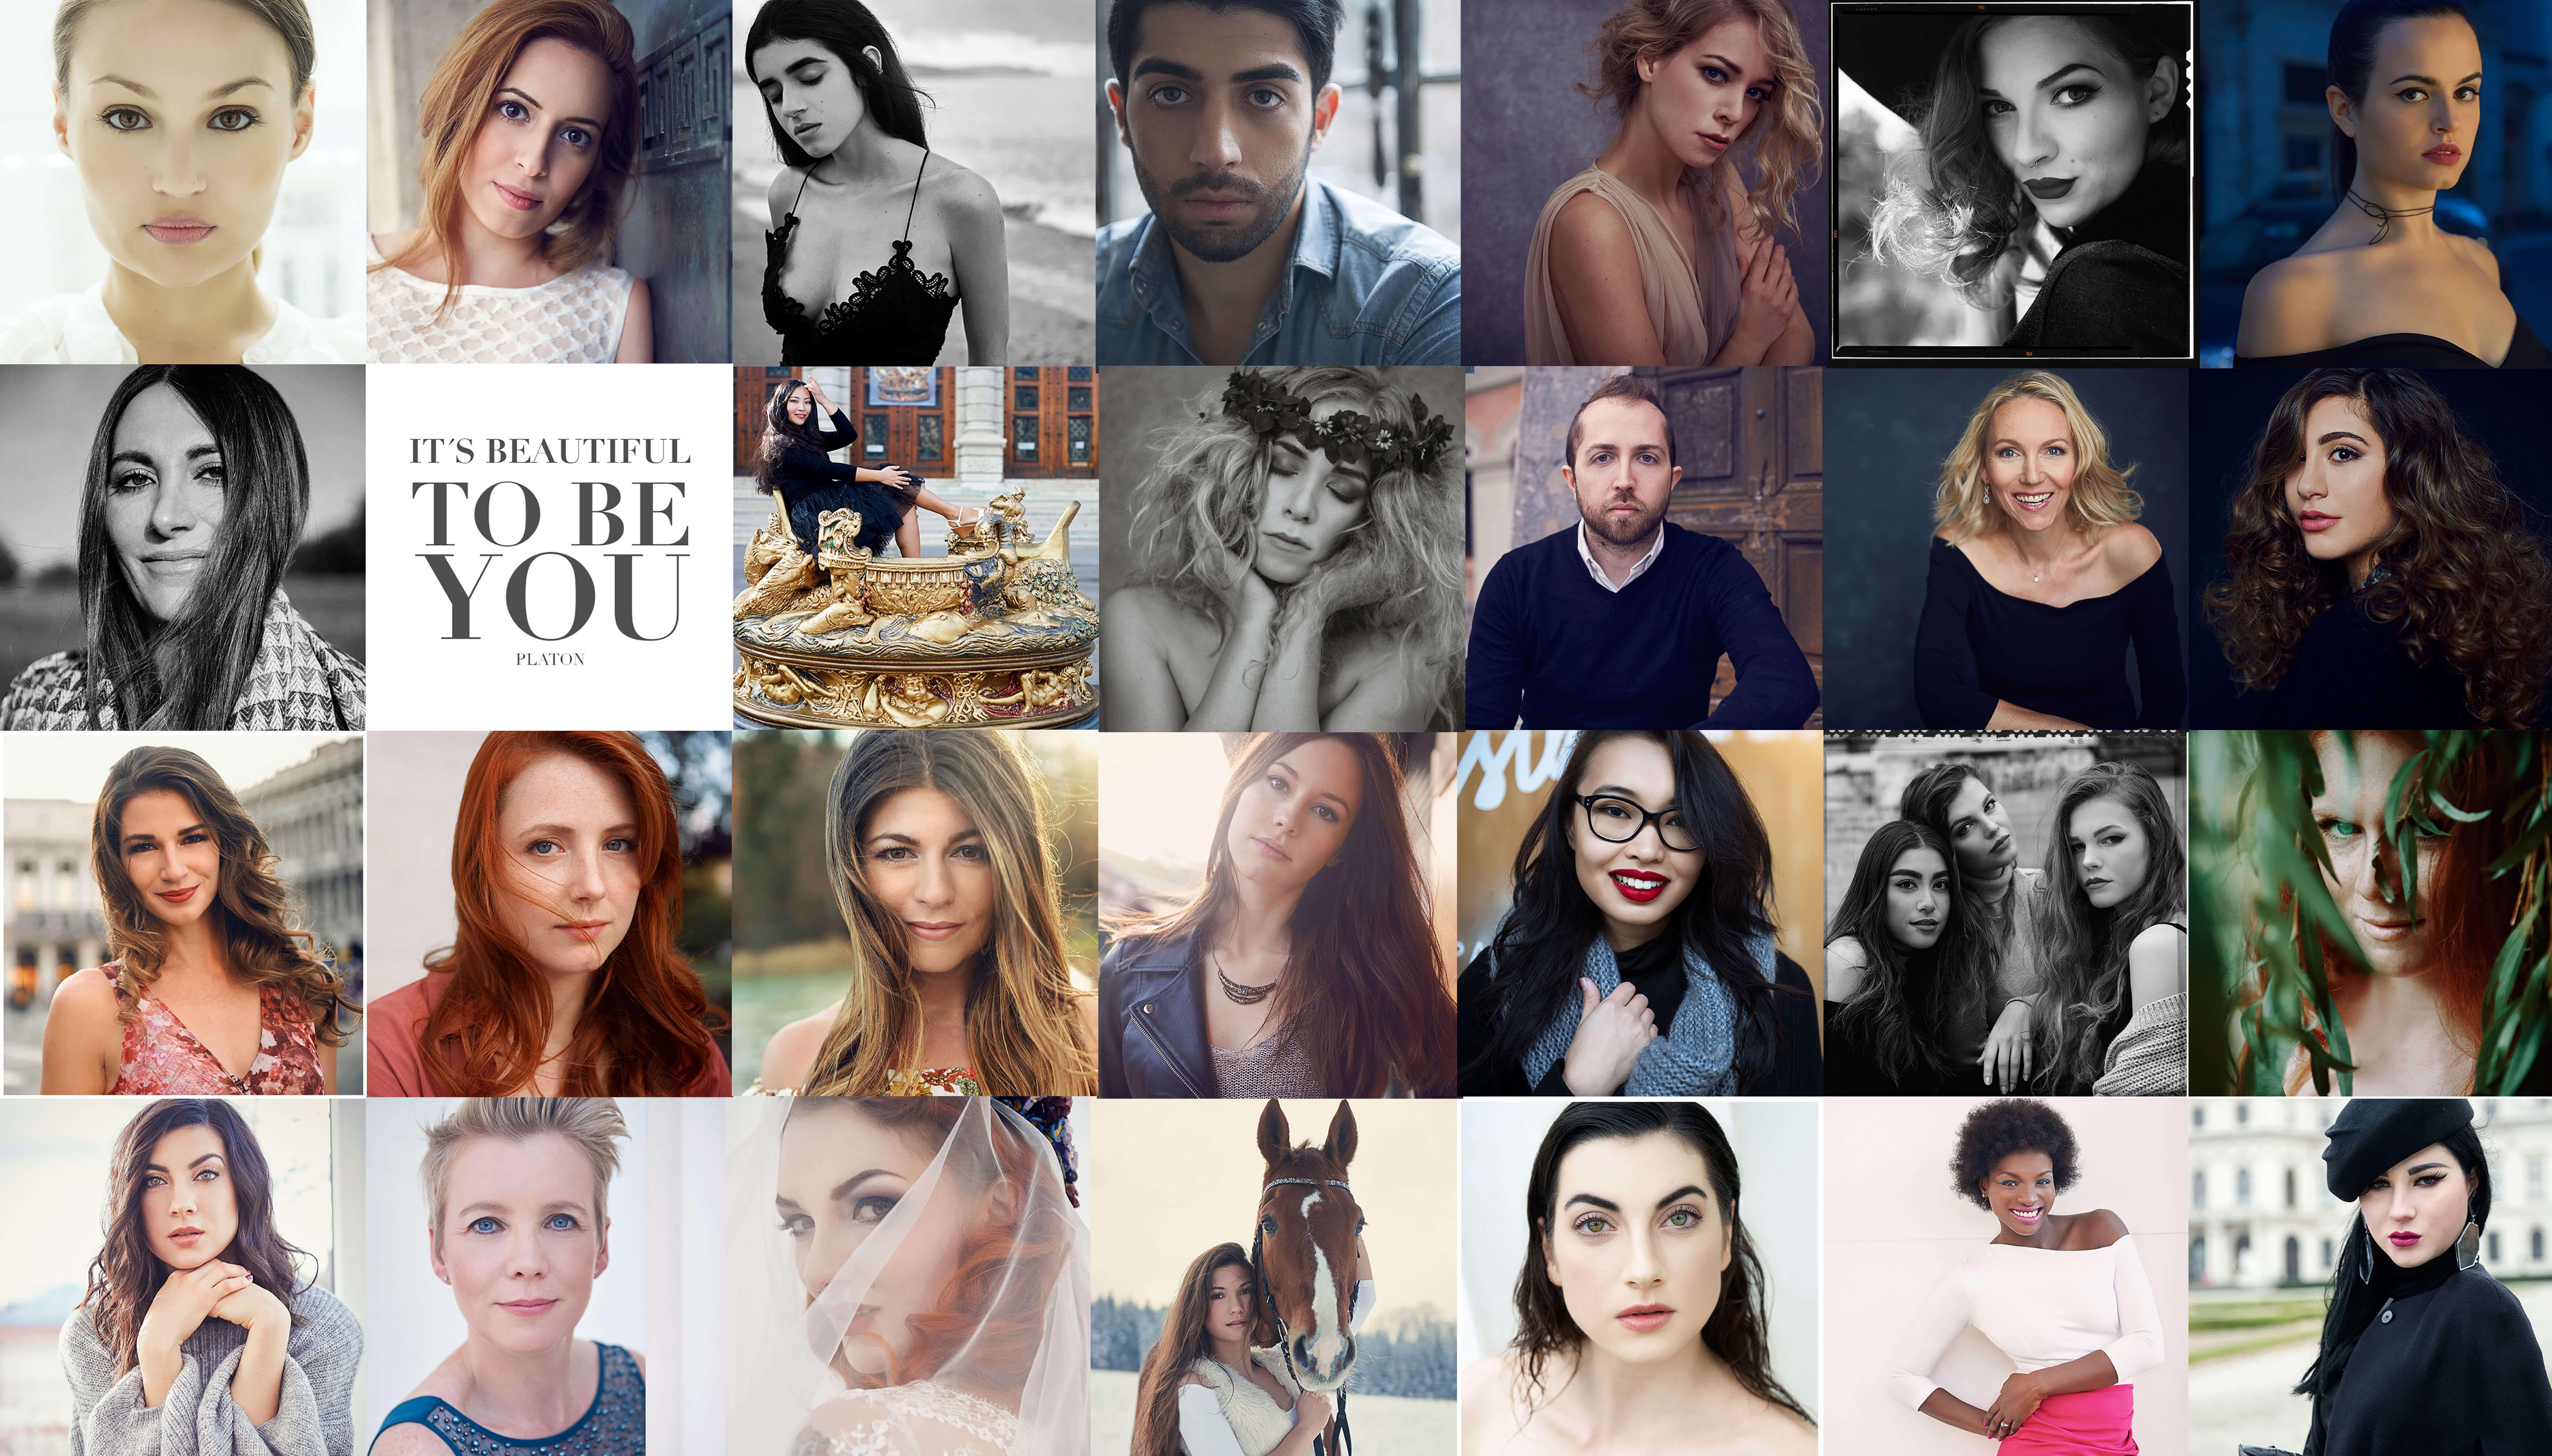 ursula schmitz, portrait photography, destination, headshots, personal branding, beauty, it´s beautiful to be you, vienna, fotograf, austria, europe